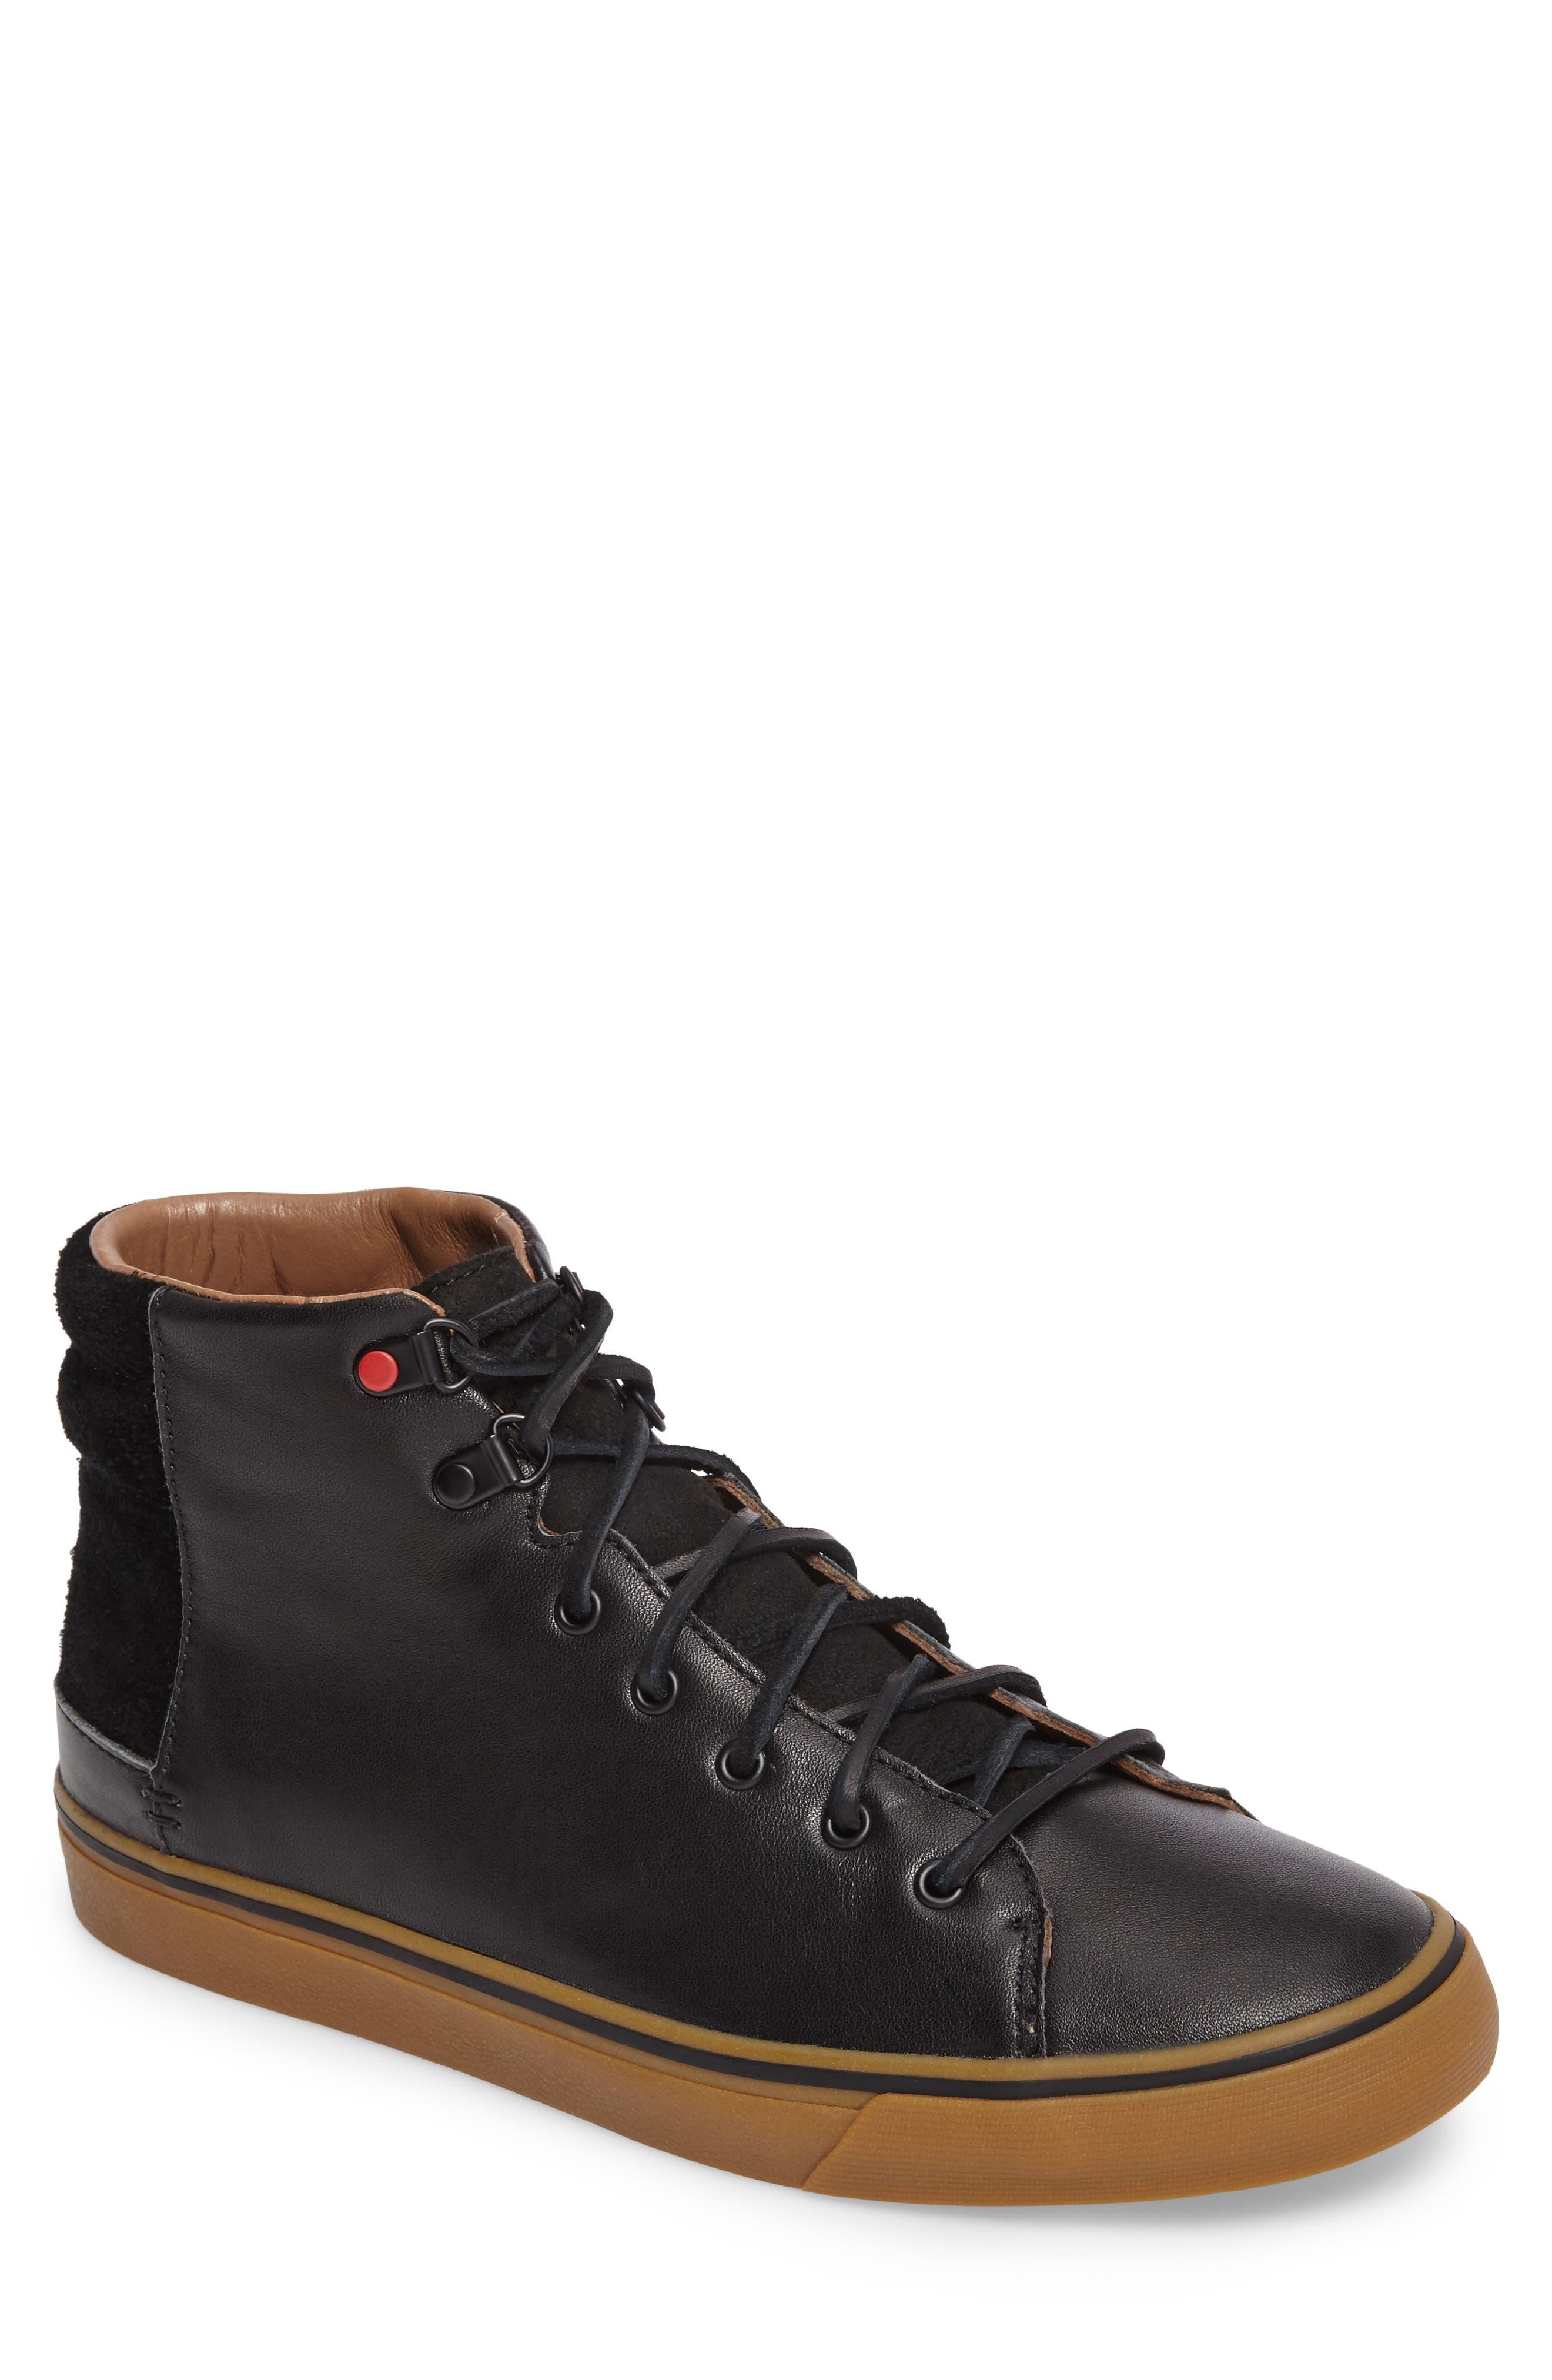 Alternate Image 1 Selected - UGG® Hoyt Luxe Genuine Shearling High Top Sneaker (Men)